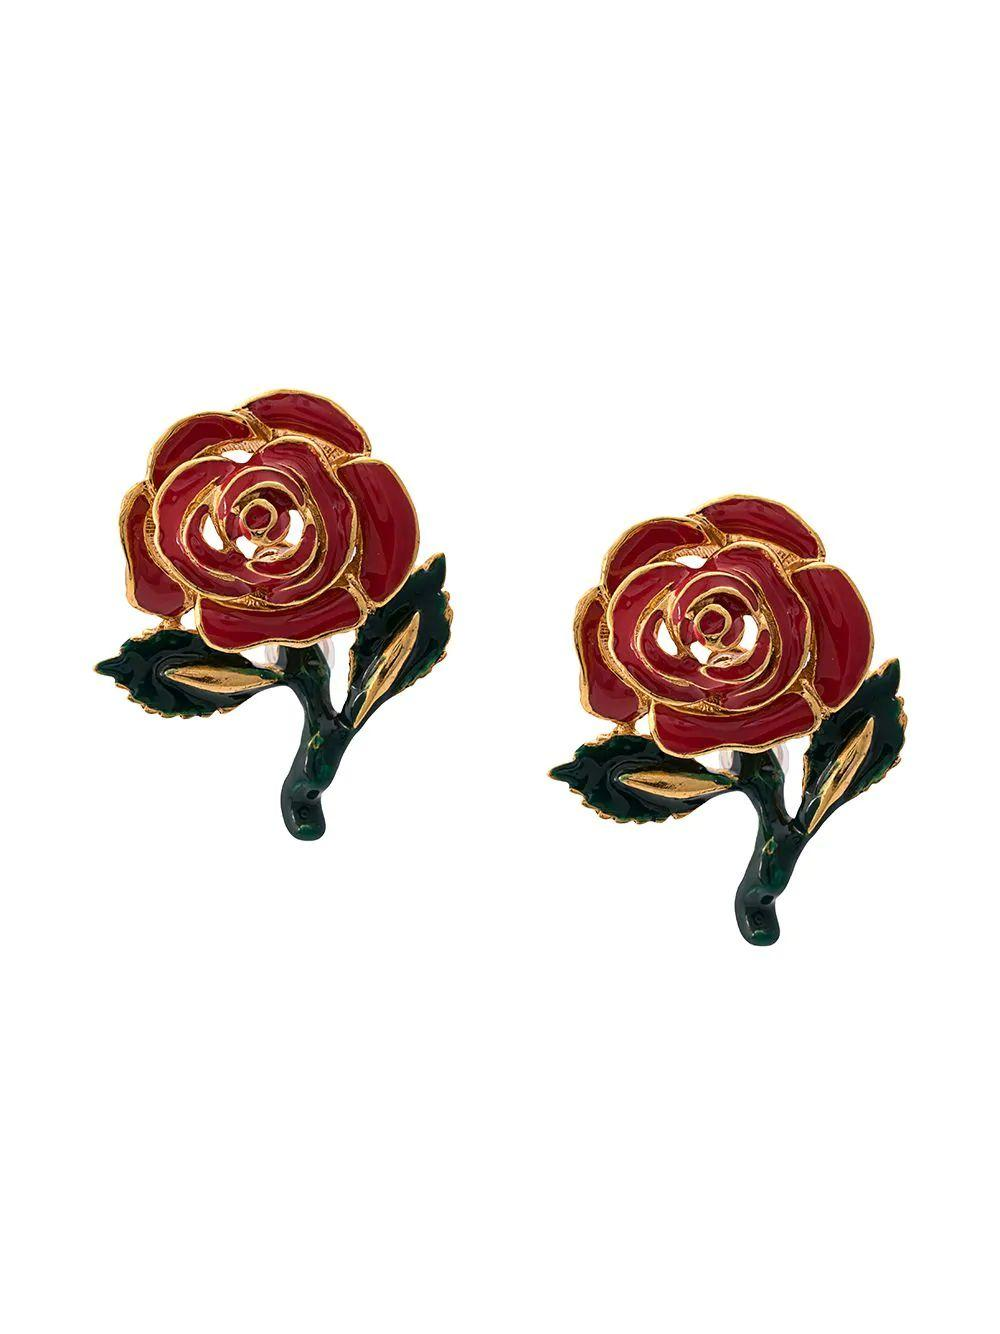 Petite Rose Resin Earring